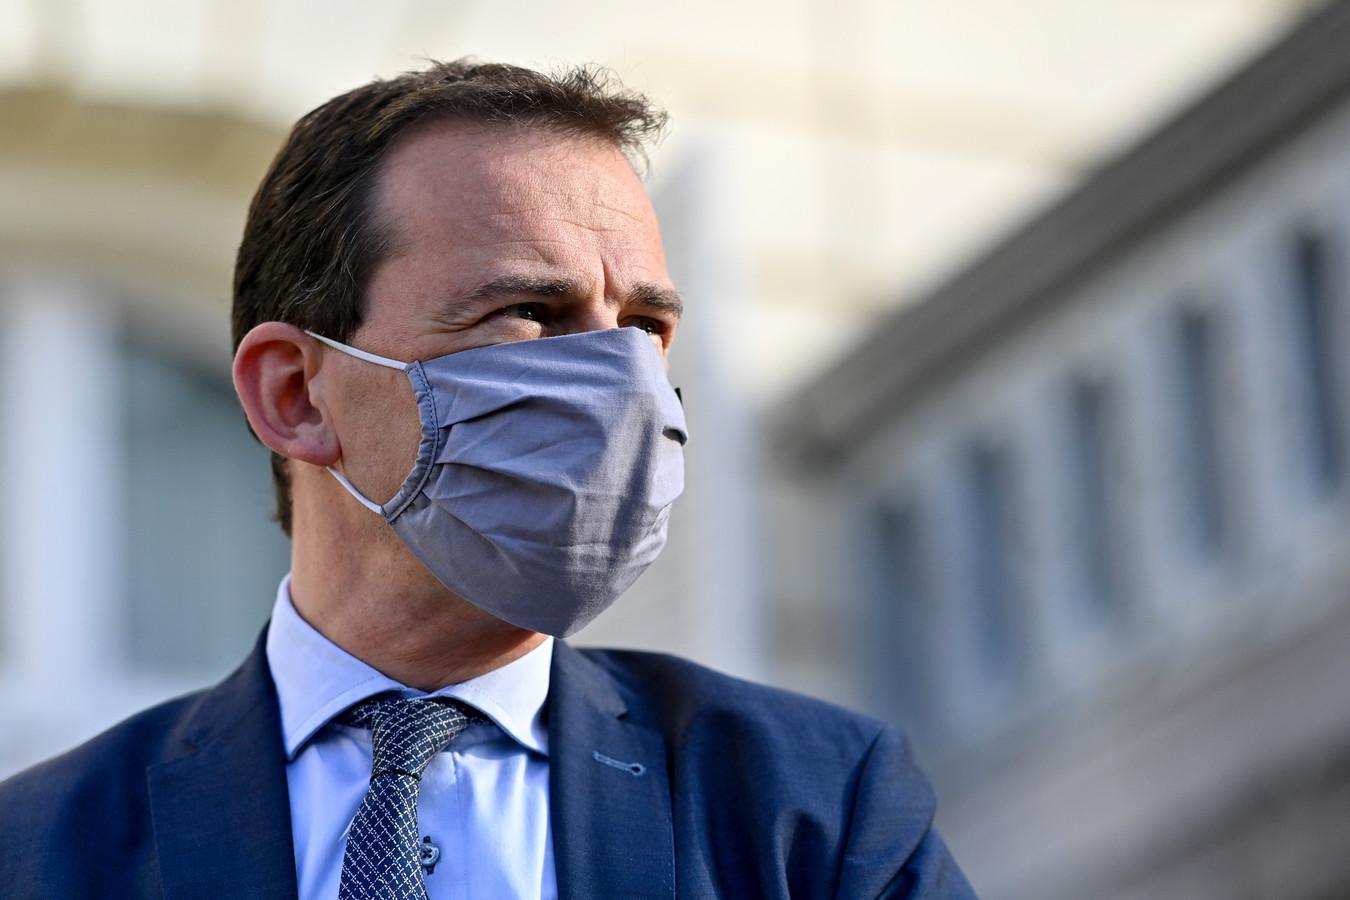 Vlaams minister van Welzijn Wouter Beke